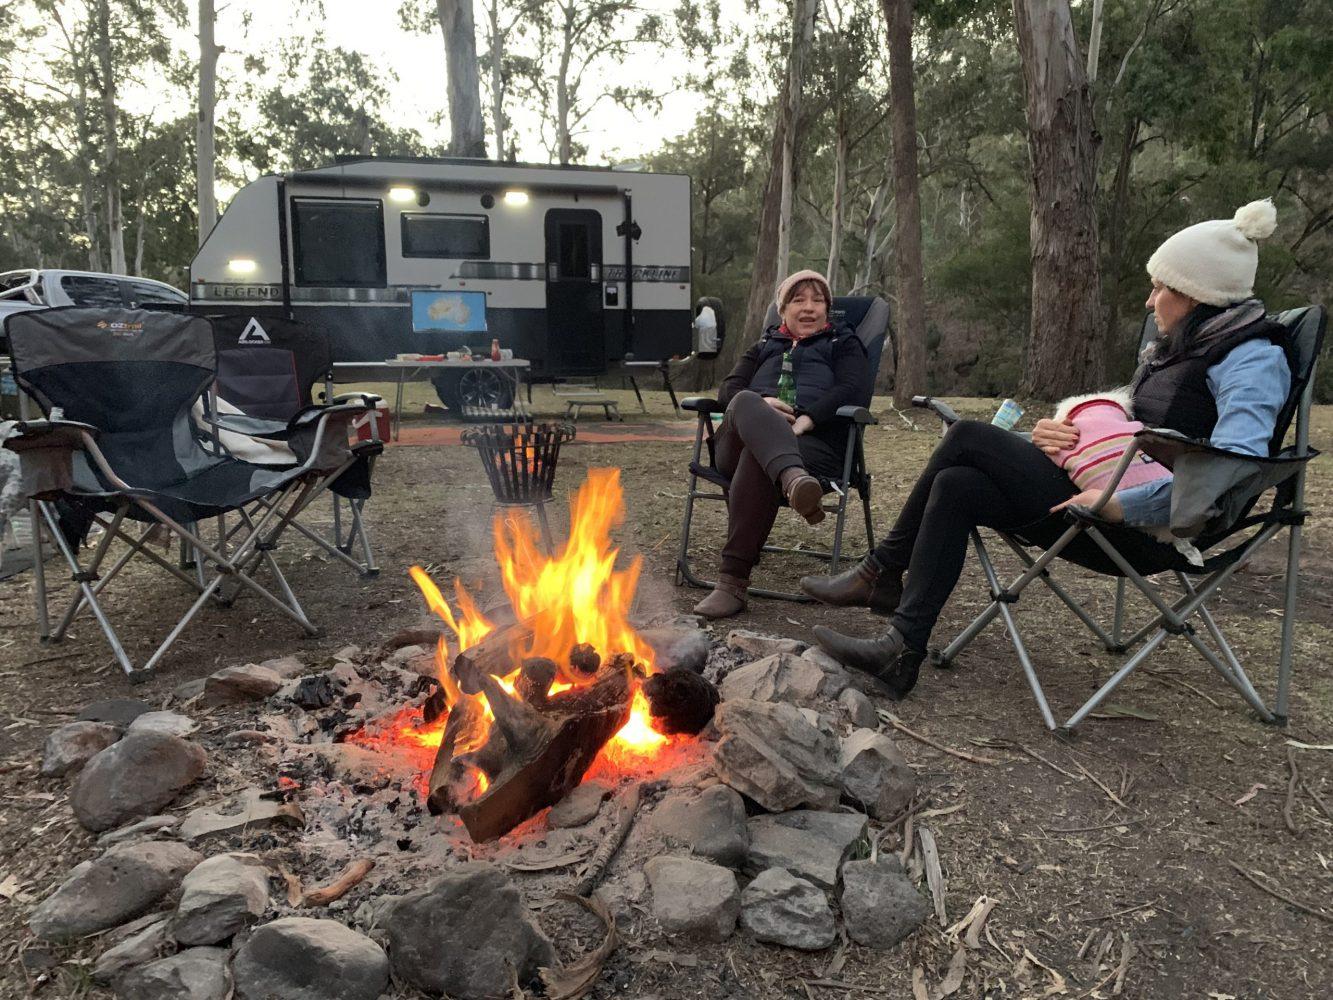 Exporer RV camping